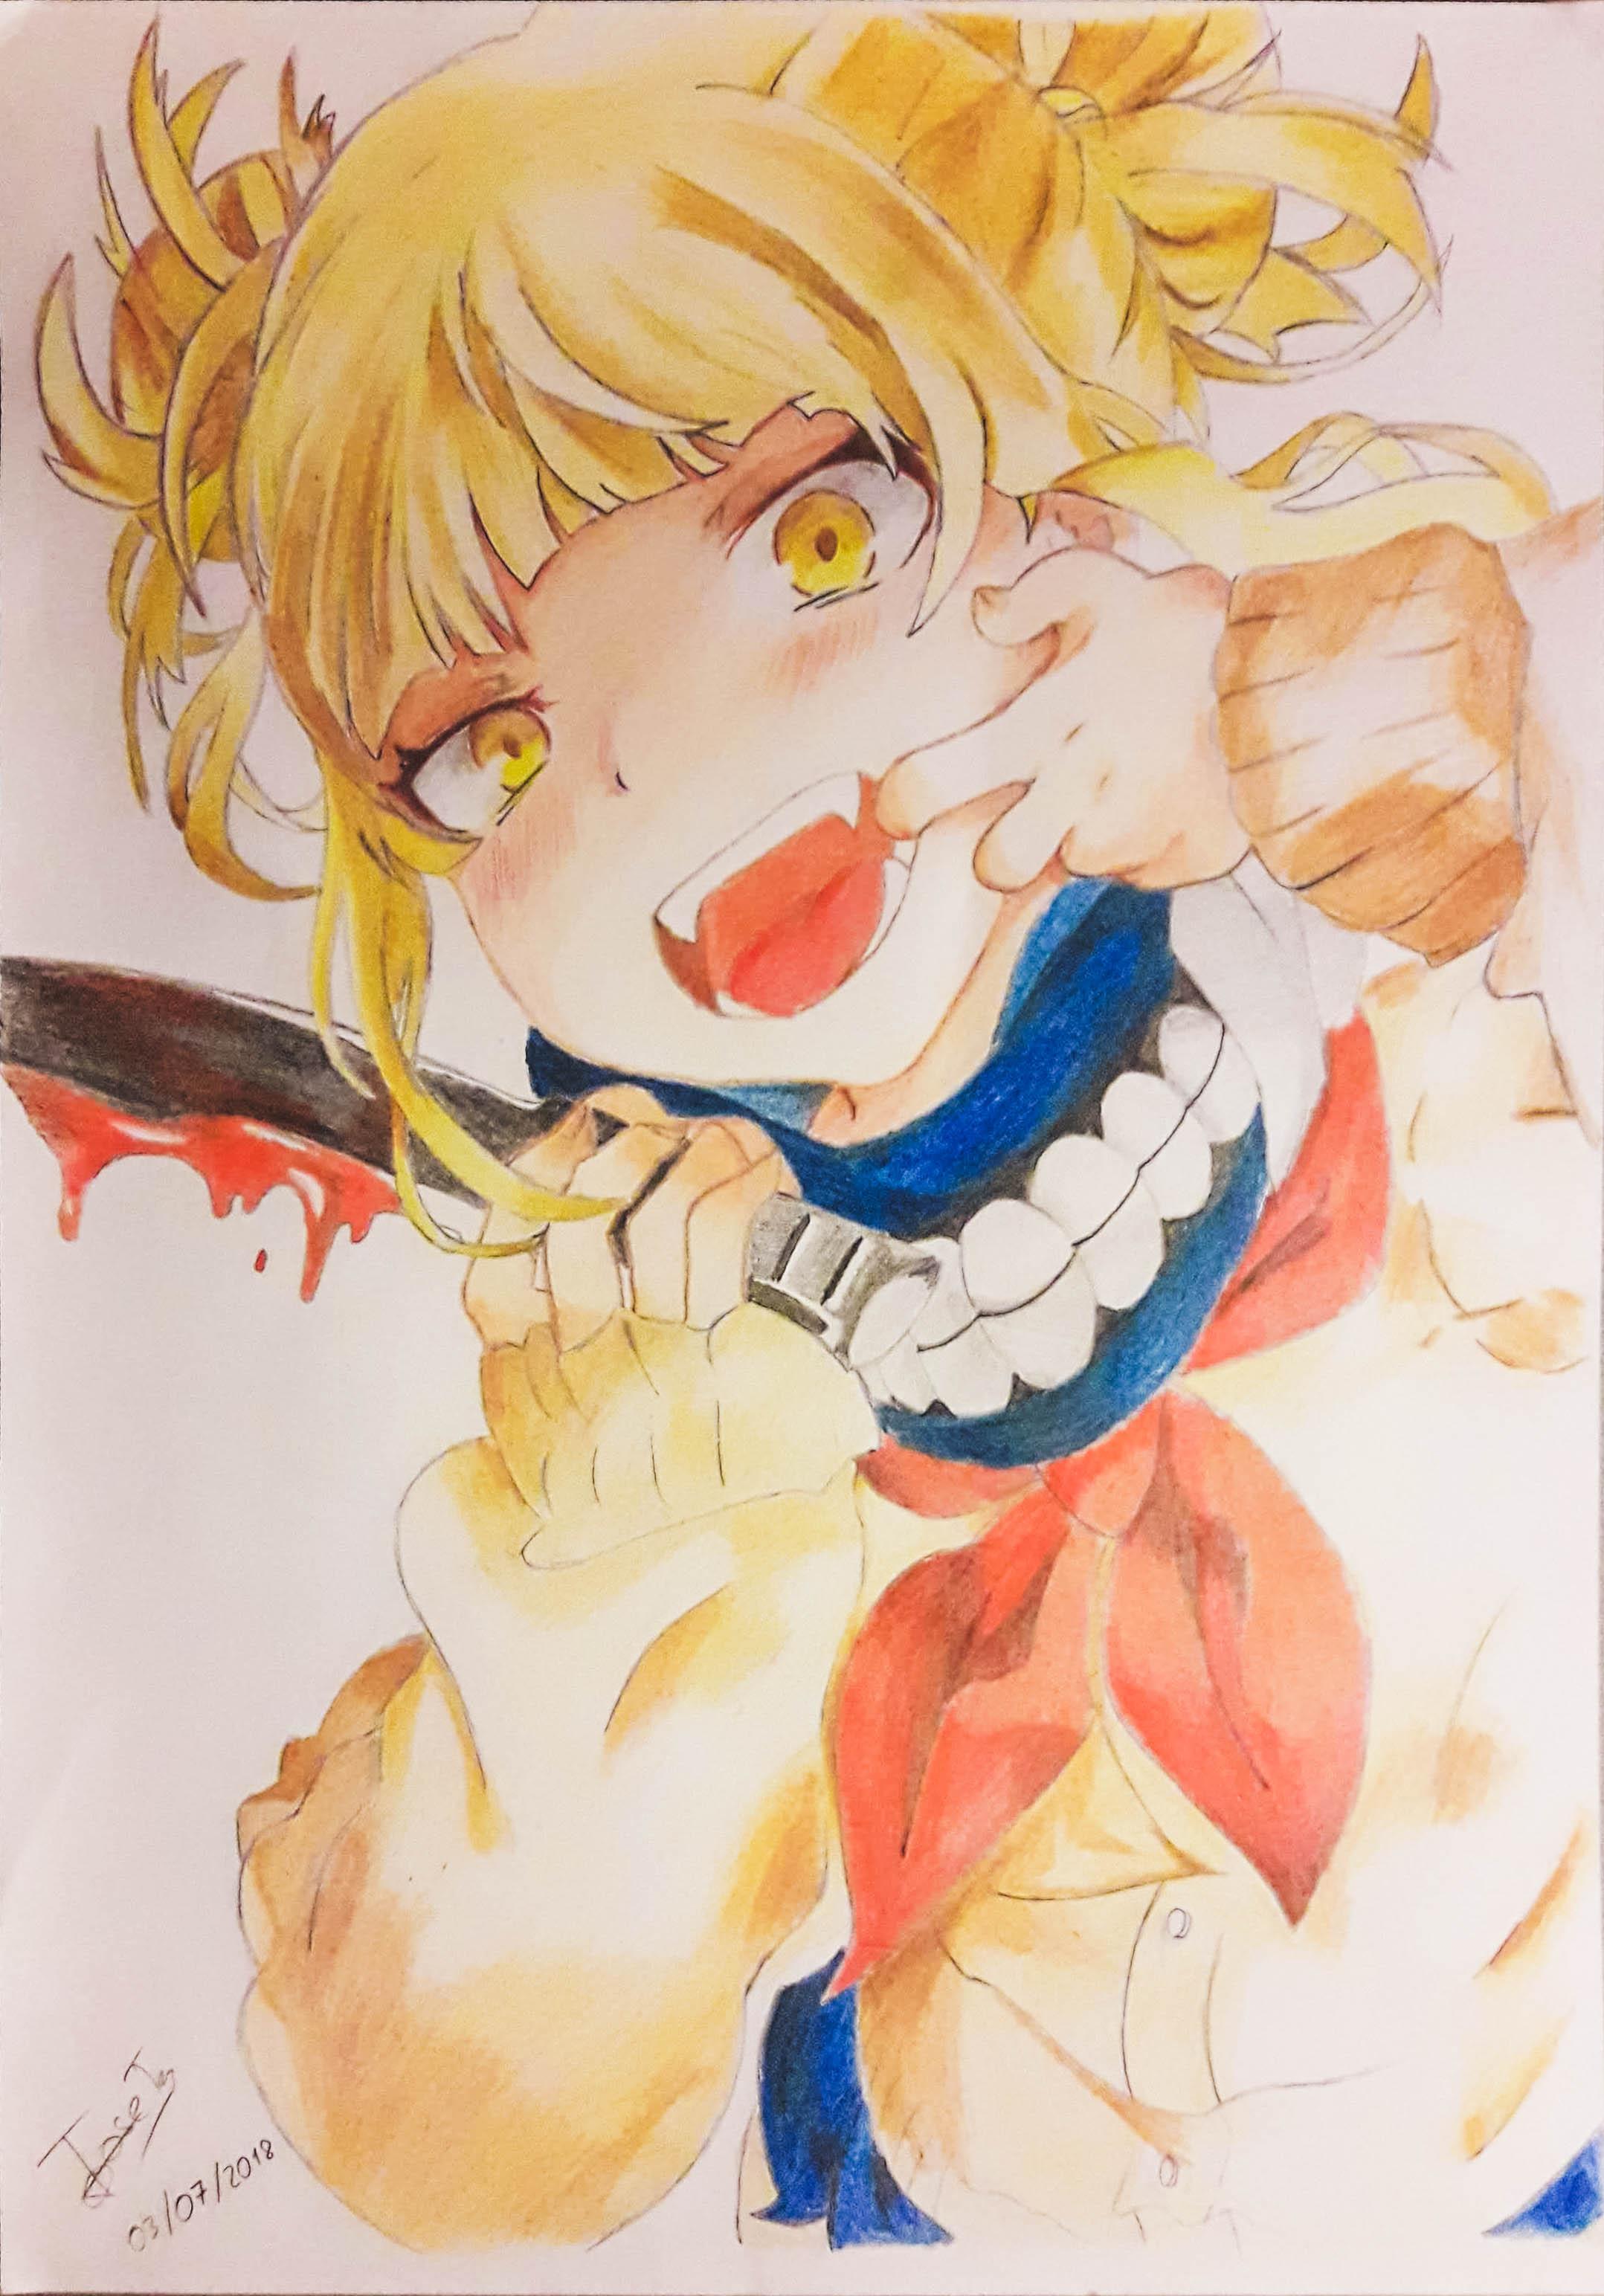 Himiko Toga Fanart Boku No Hero Academia By Ev3r9reen On Deviantart